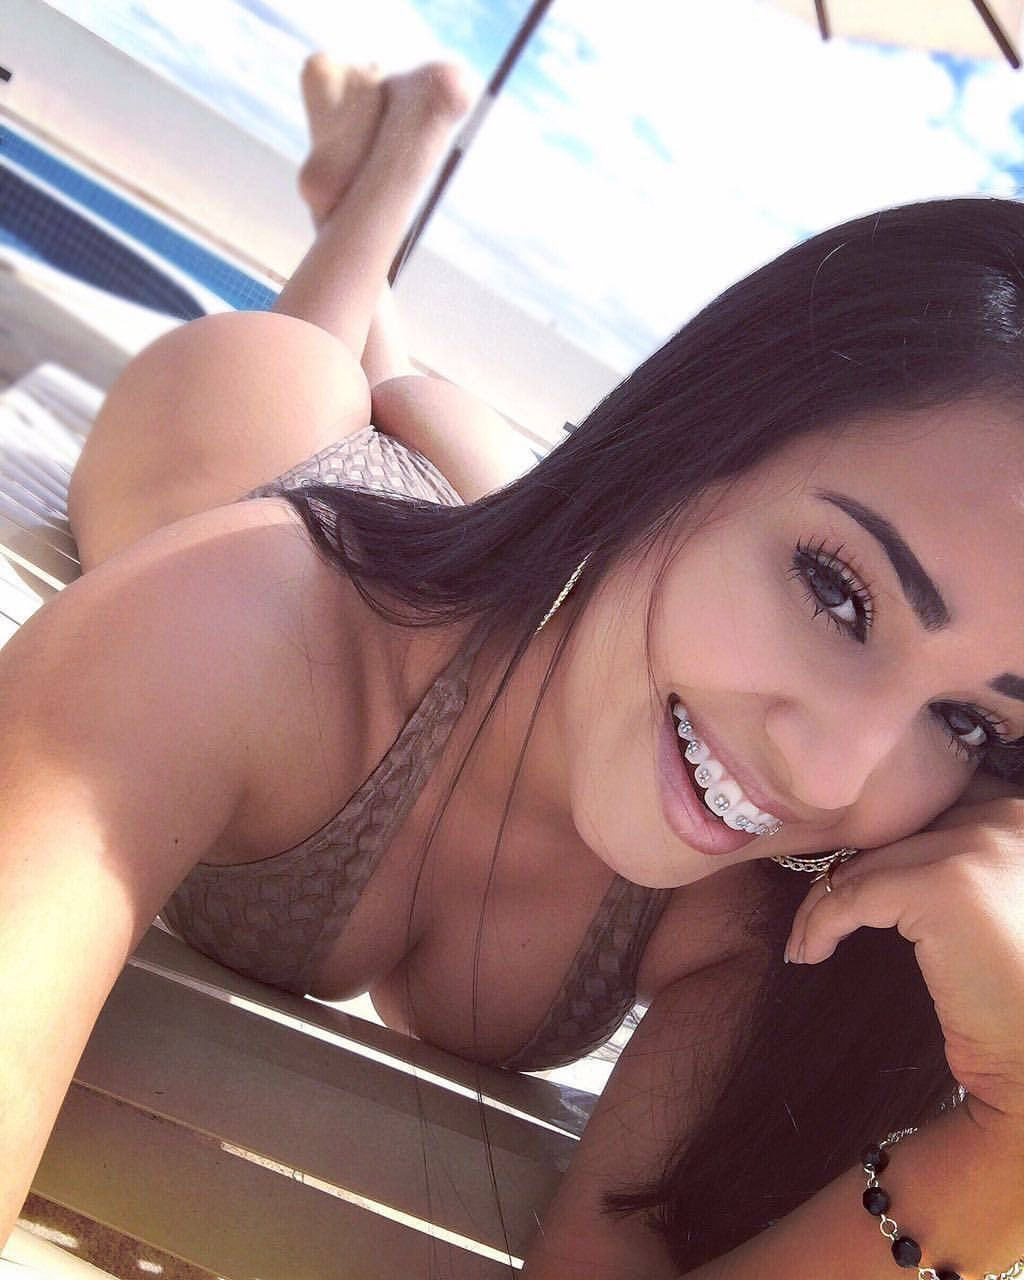 Porn Real Escort Chatroulette Girl